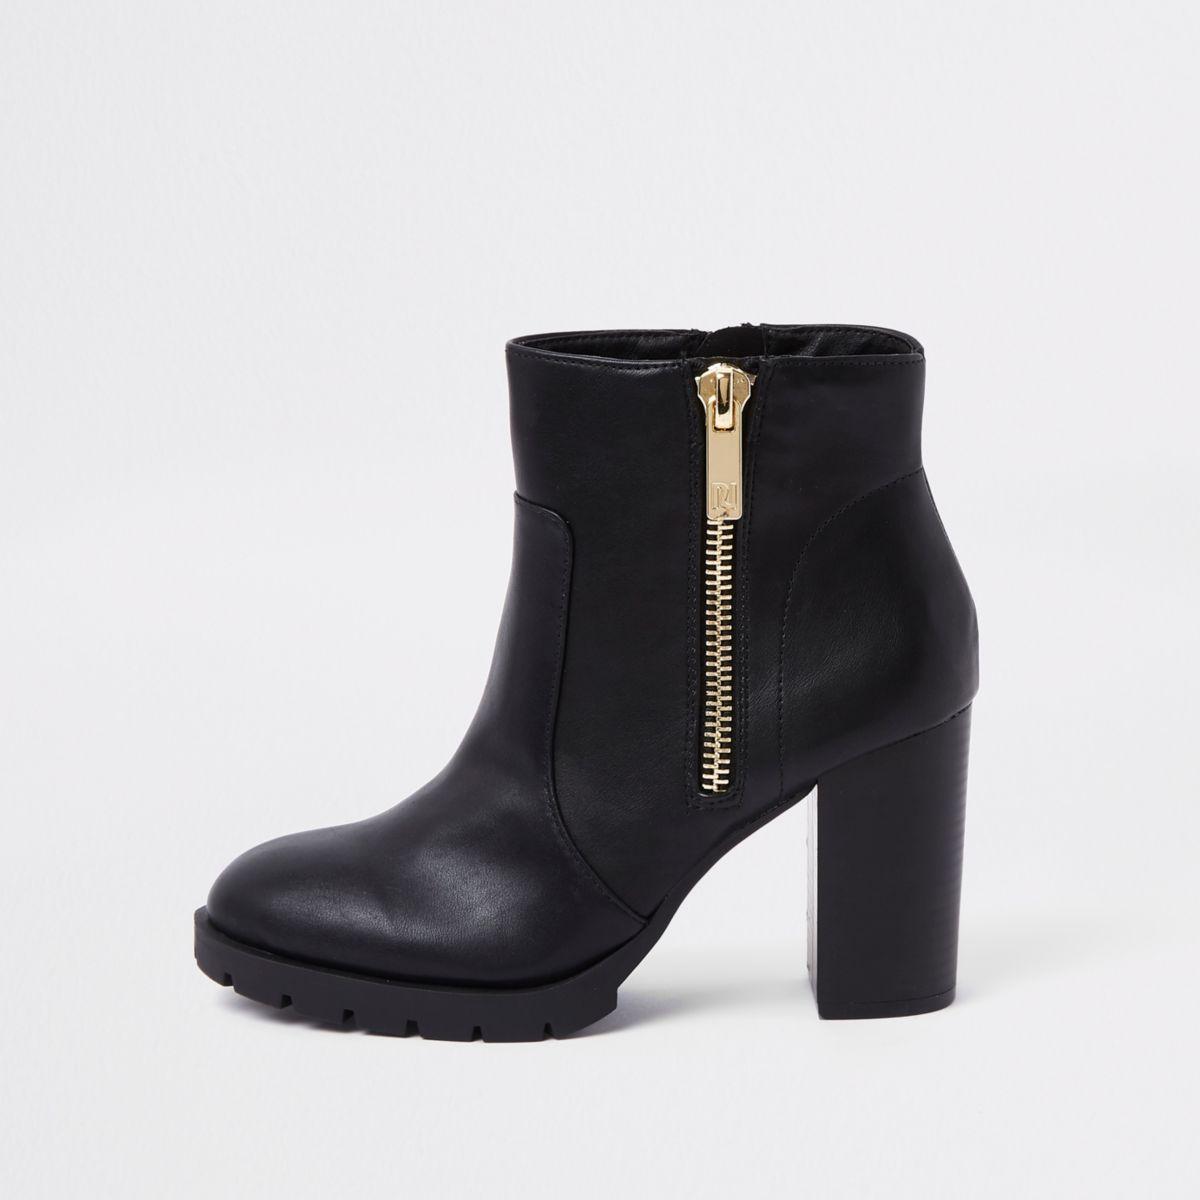 Black chunky side zip block heel ankle boots